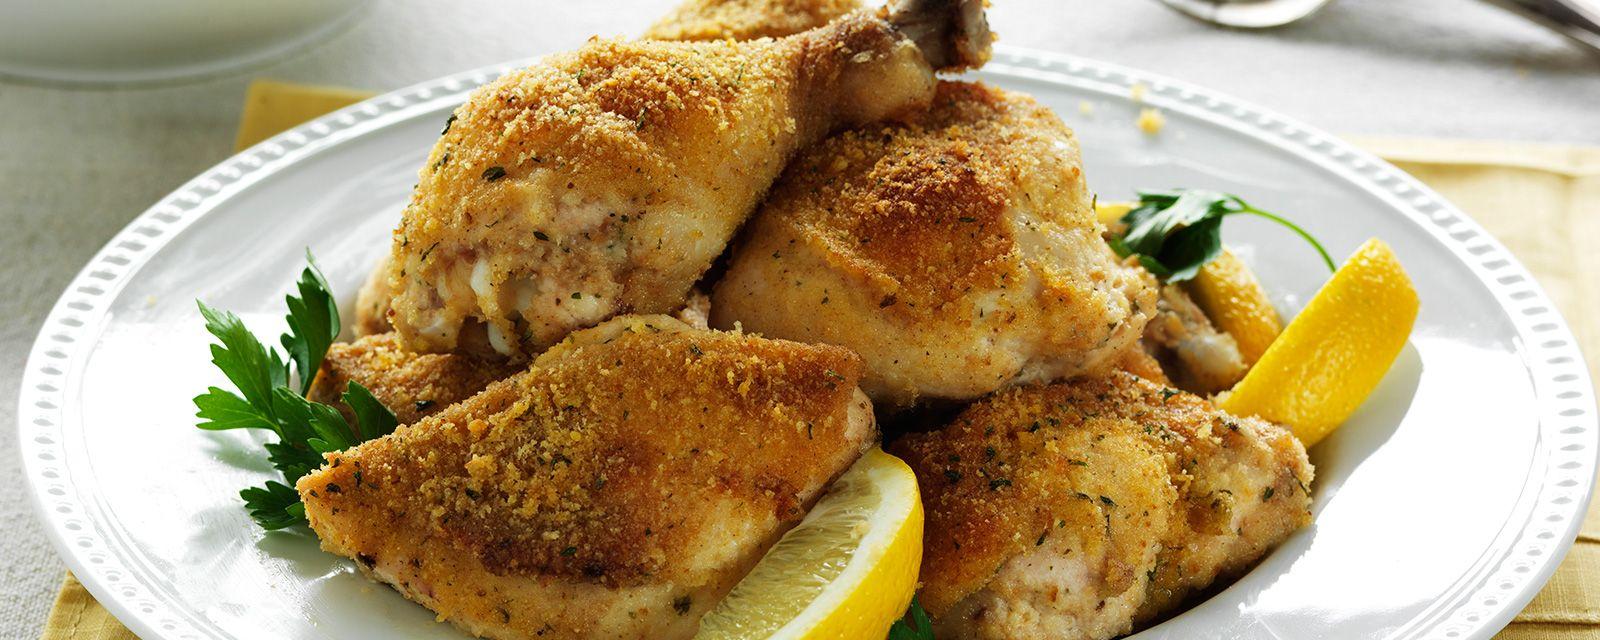 Original Ranch Crispy Chicken Recipe Ez Pz Recipe Z Crispy Chicken Cooking Recipes Food